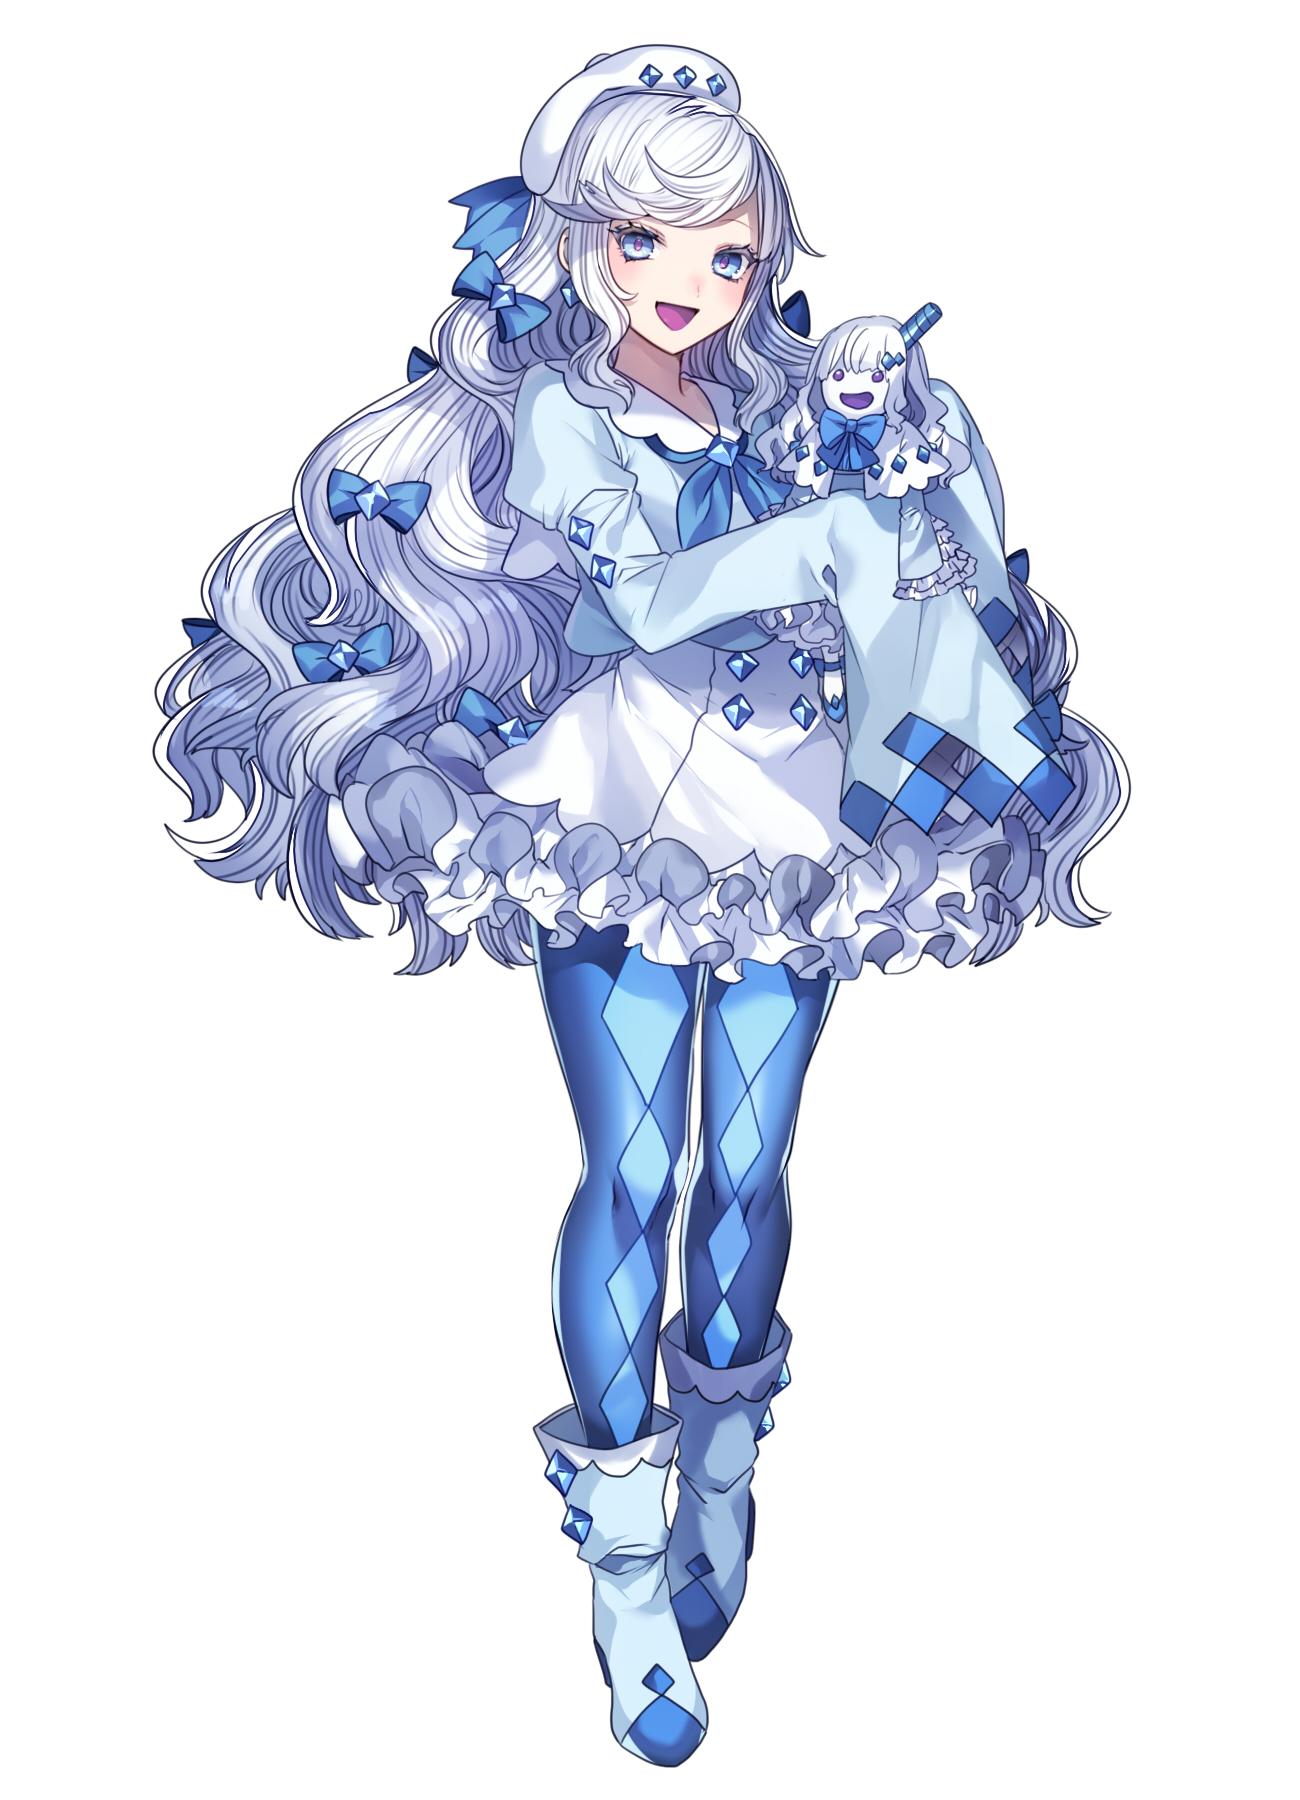 Vanilluxe   Pokmon   Mobile Wallpaper 2041708   Zerochan Anime 1300x1800